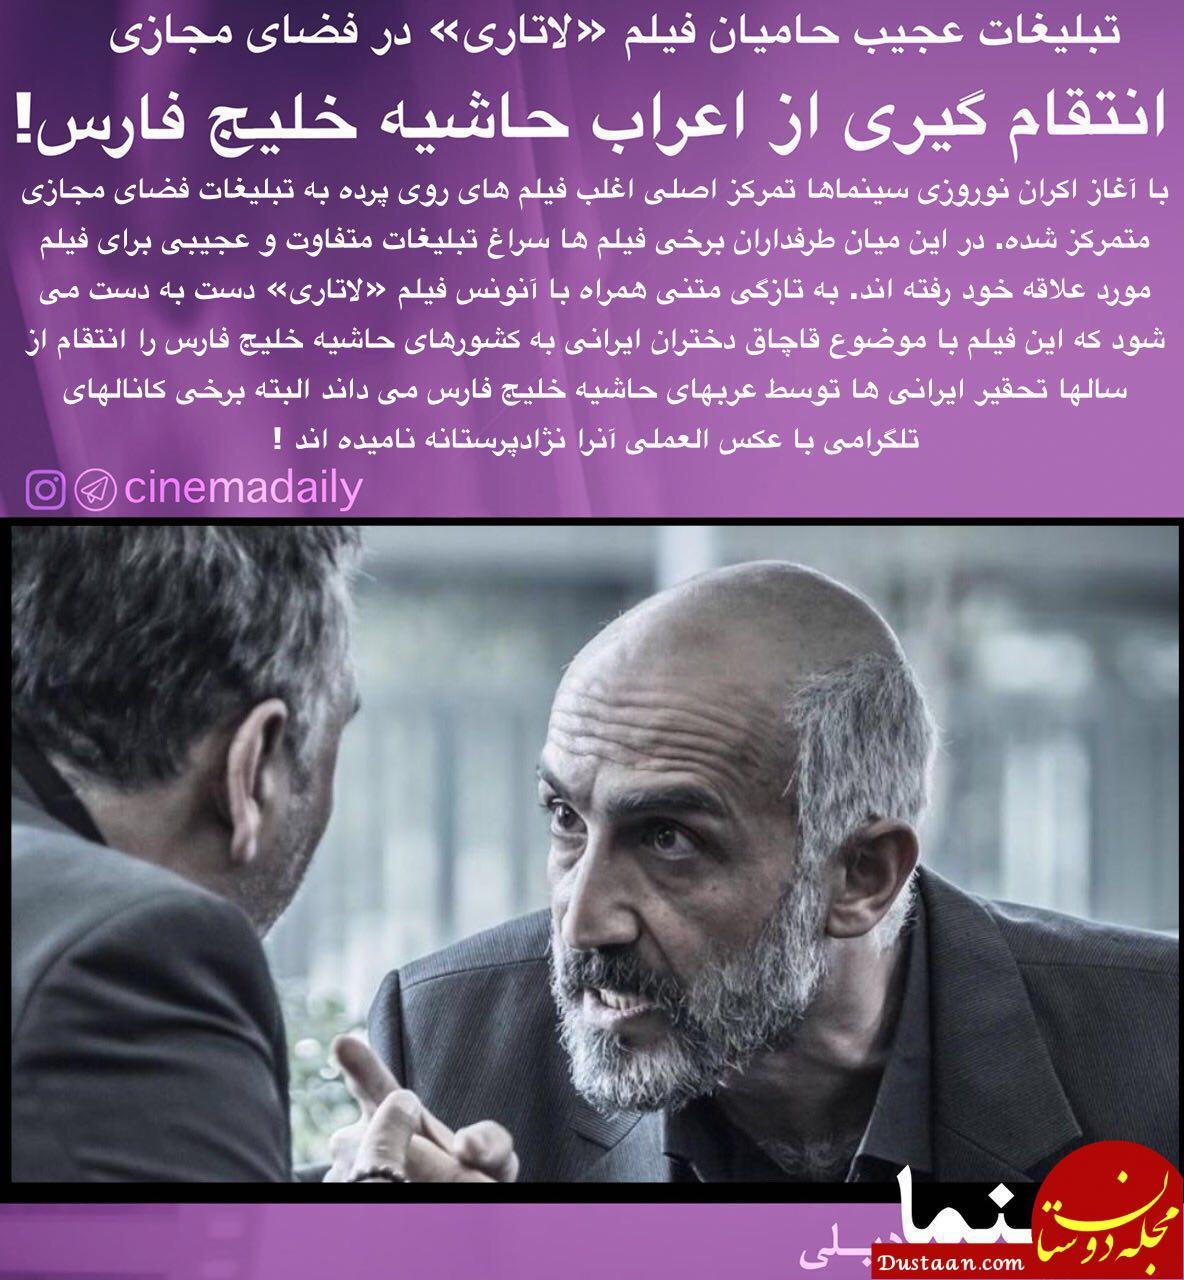 www.dustaan.com انتقام گیری از اعراب حاشیه خلیج فارس! +عکس